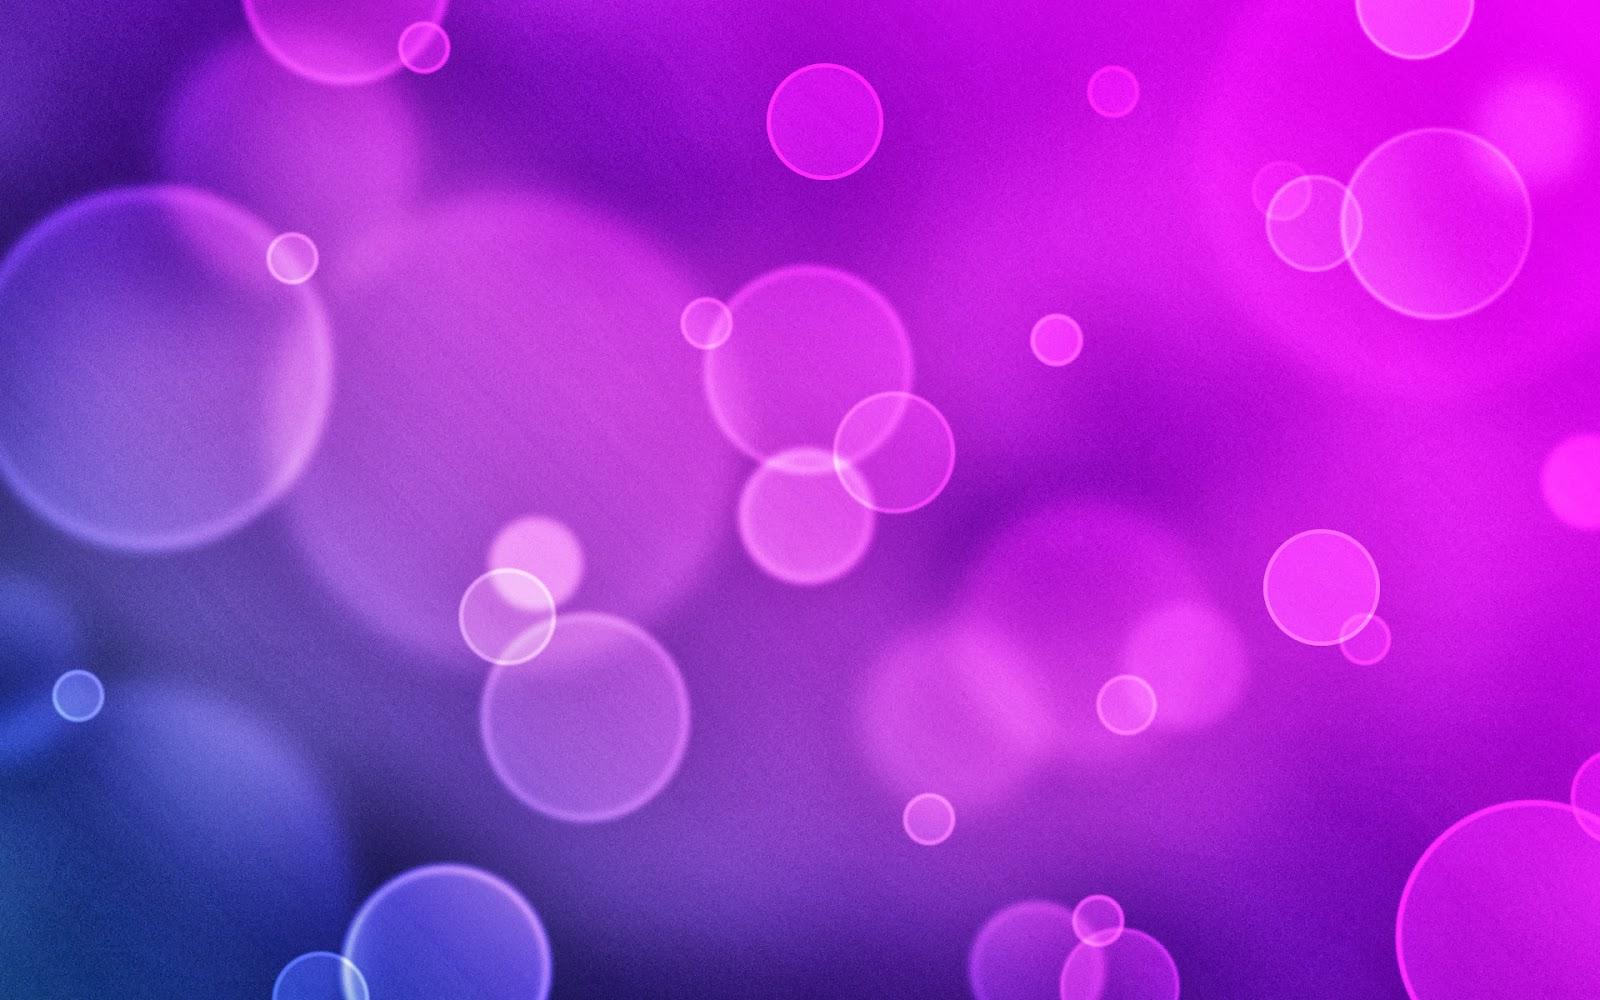 Free Download Hd Wallpapers Desktop Purple Background Hd Desktop Wallpapers 1600x1000 For Your Desktop Mobile Tablet Explore 45 Purple Wallpapers For Laptop Free Wallpaper For Laptop Cute Wallpapers For